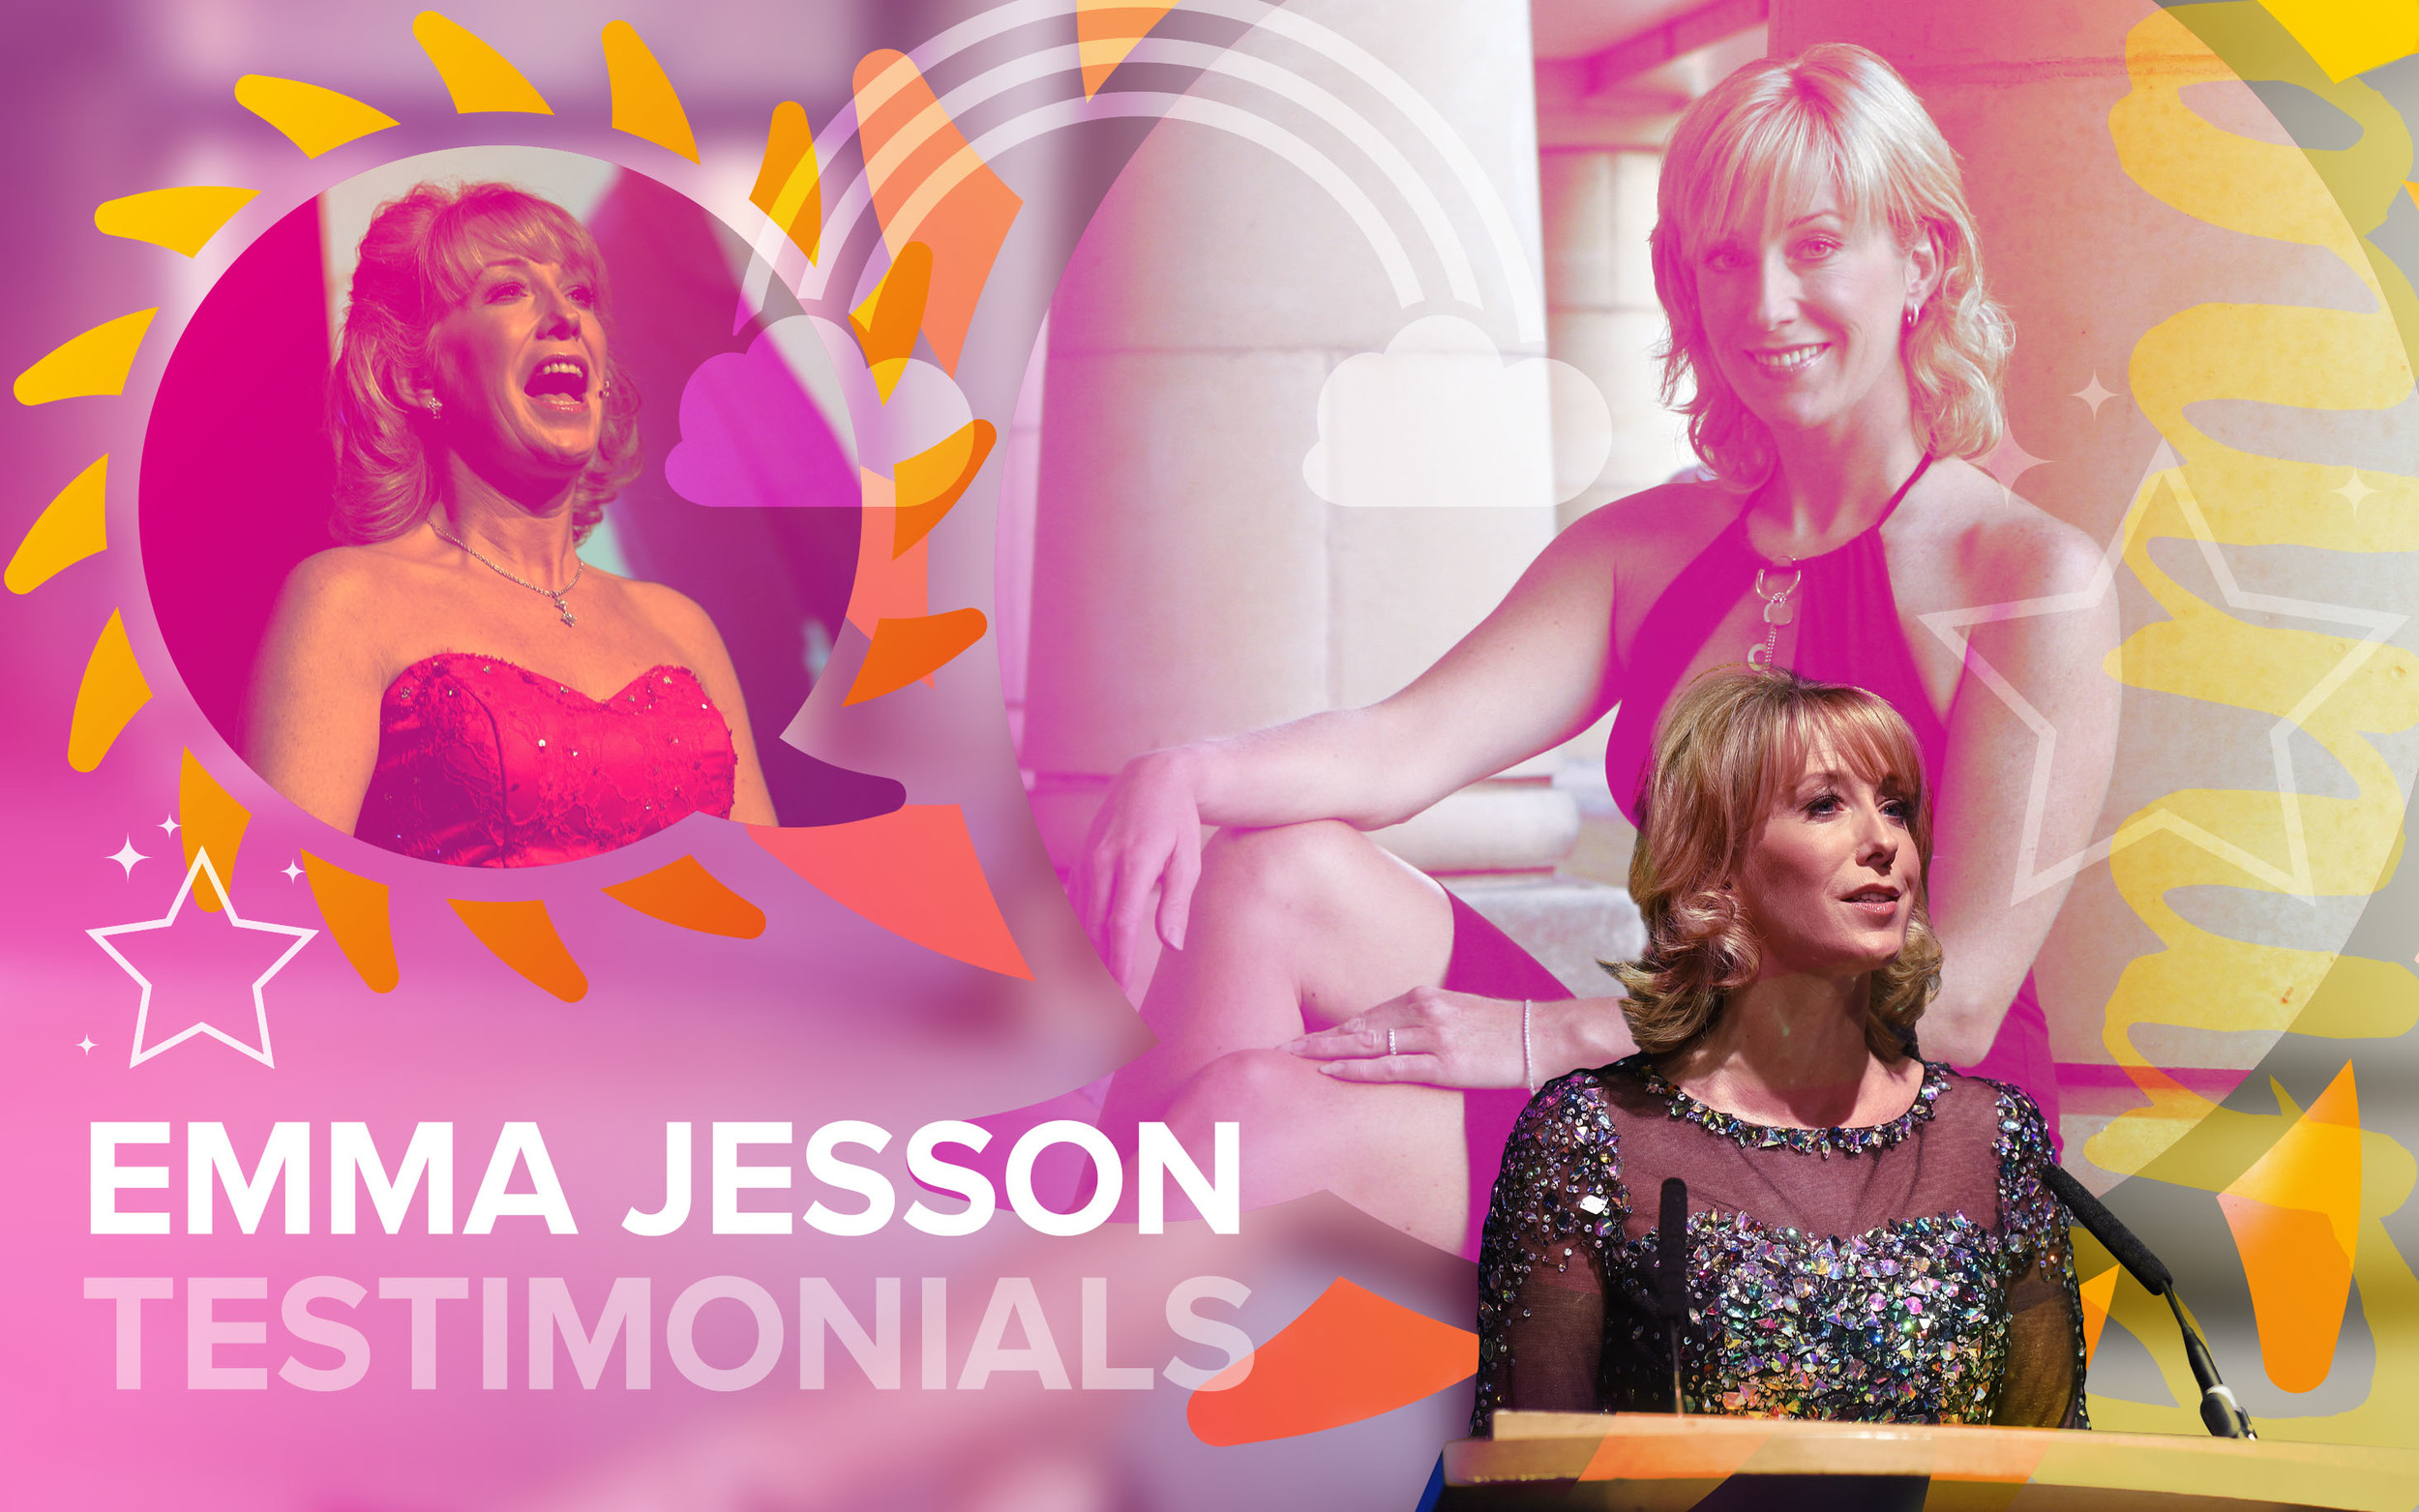 Emma Jesson Testimonials